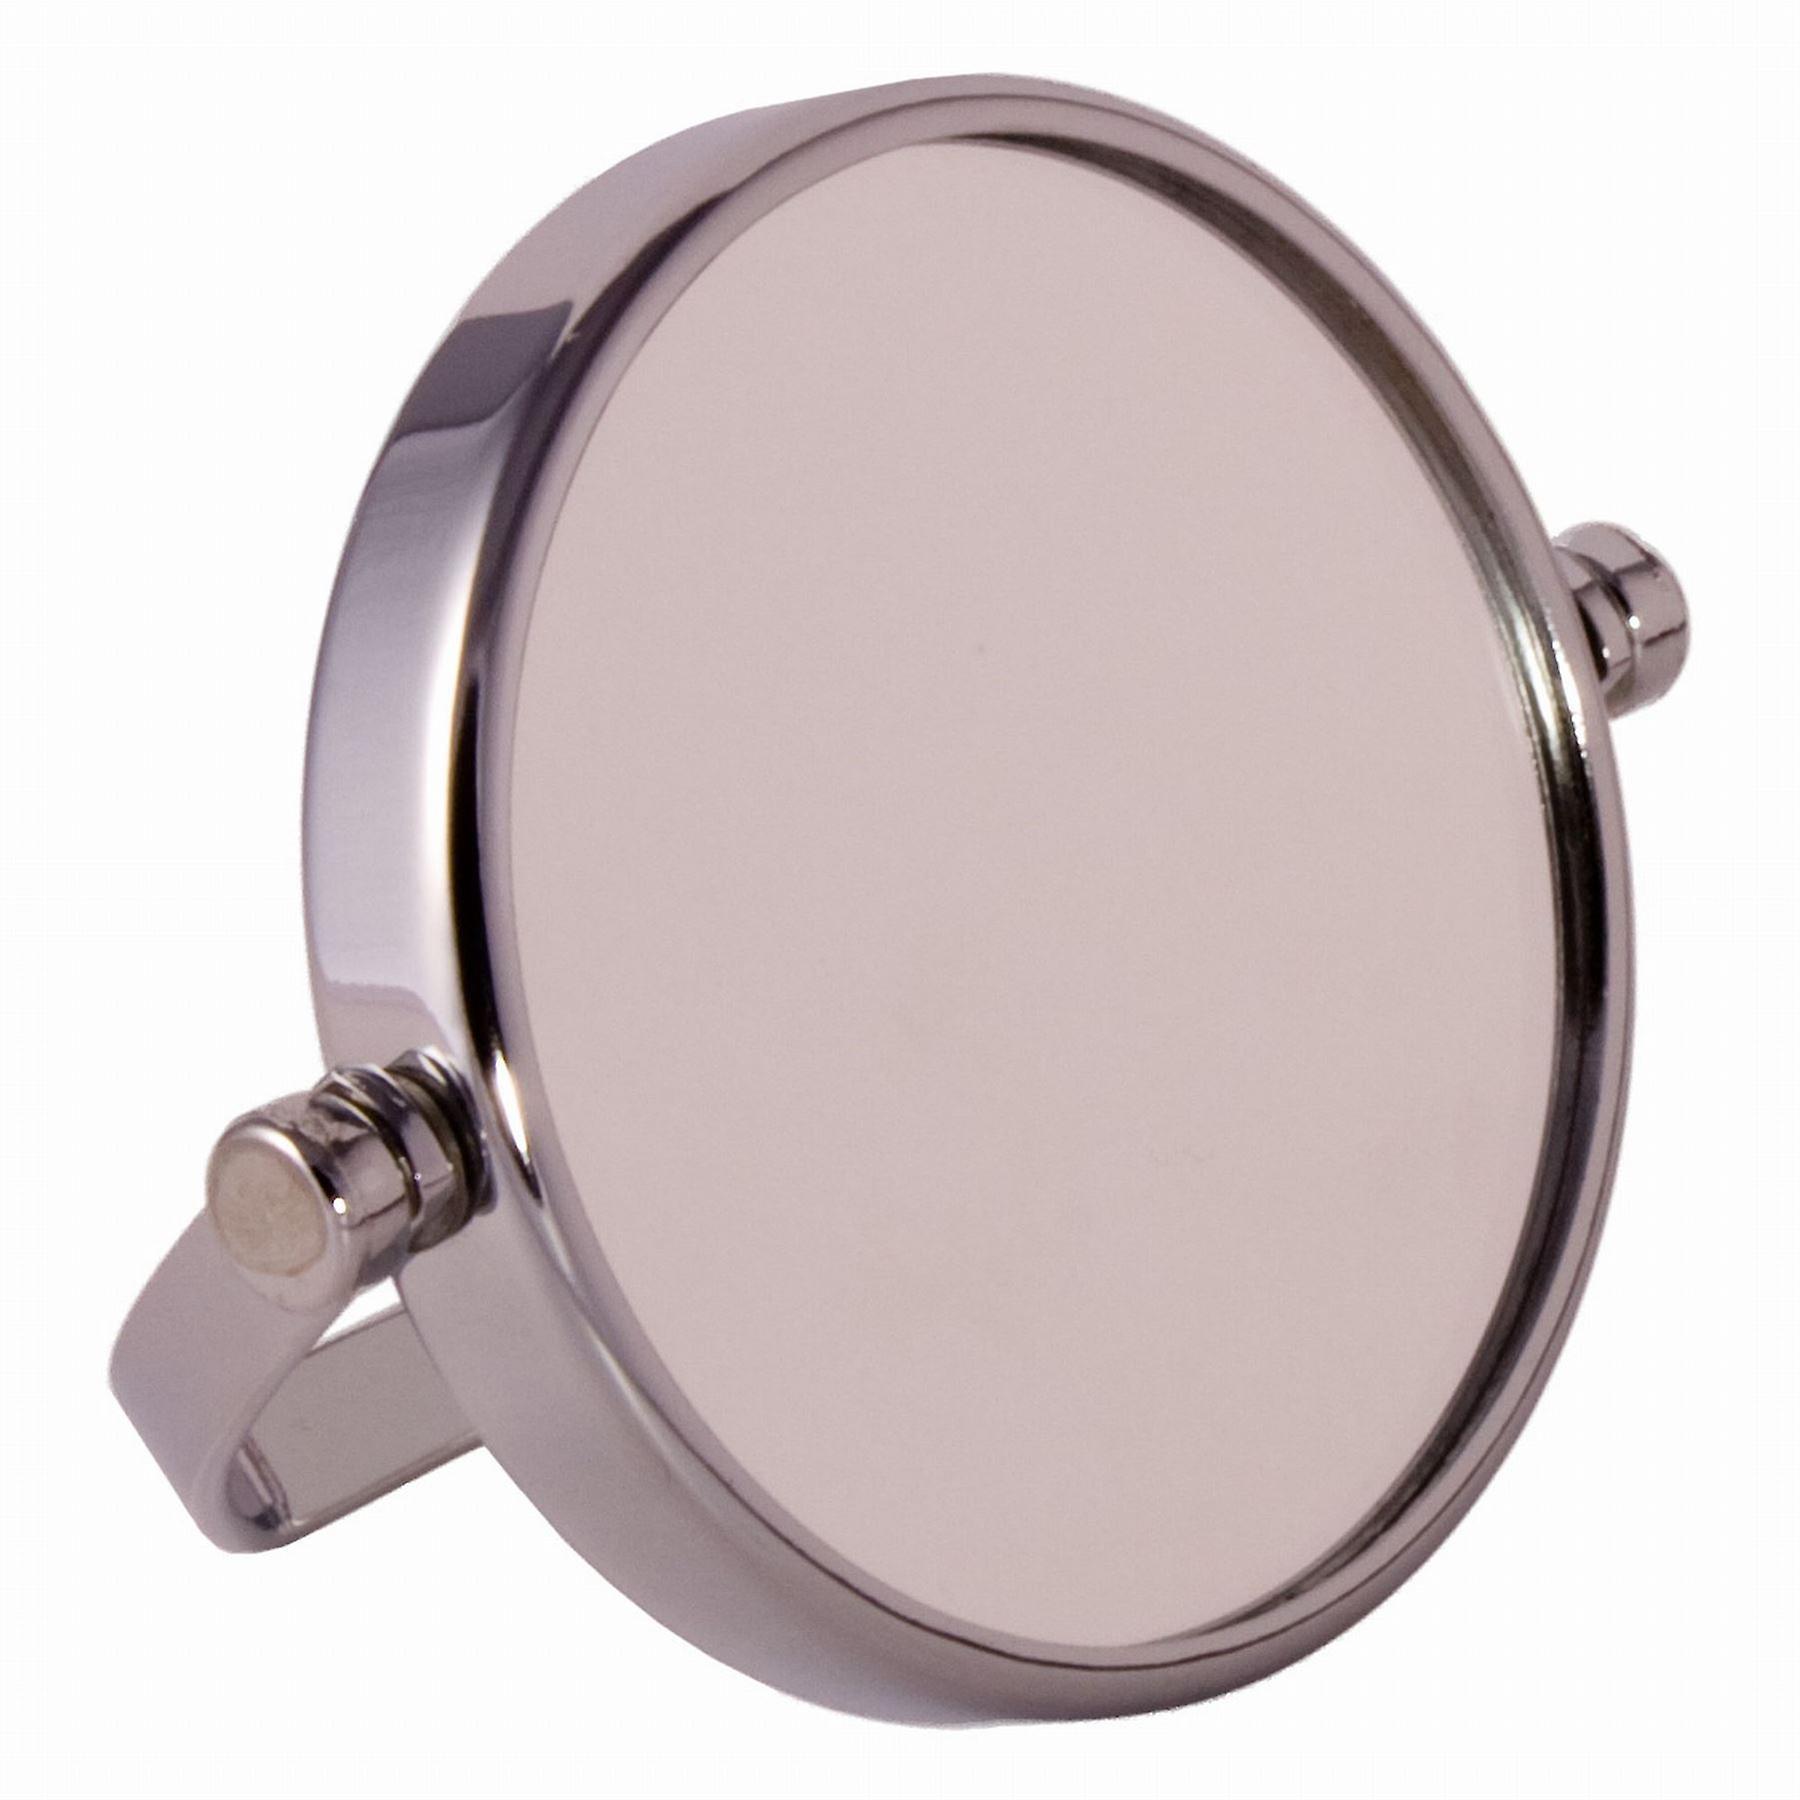 FMG Small Round Chrome Free Standing 7X Magnifying Travel Mirror 10cm Diameter